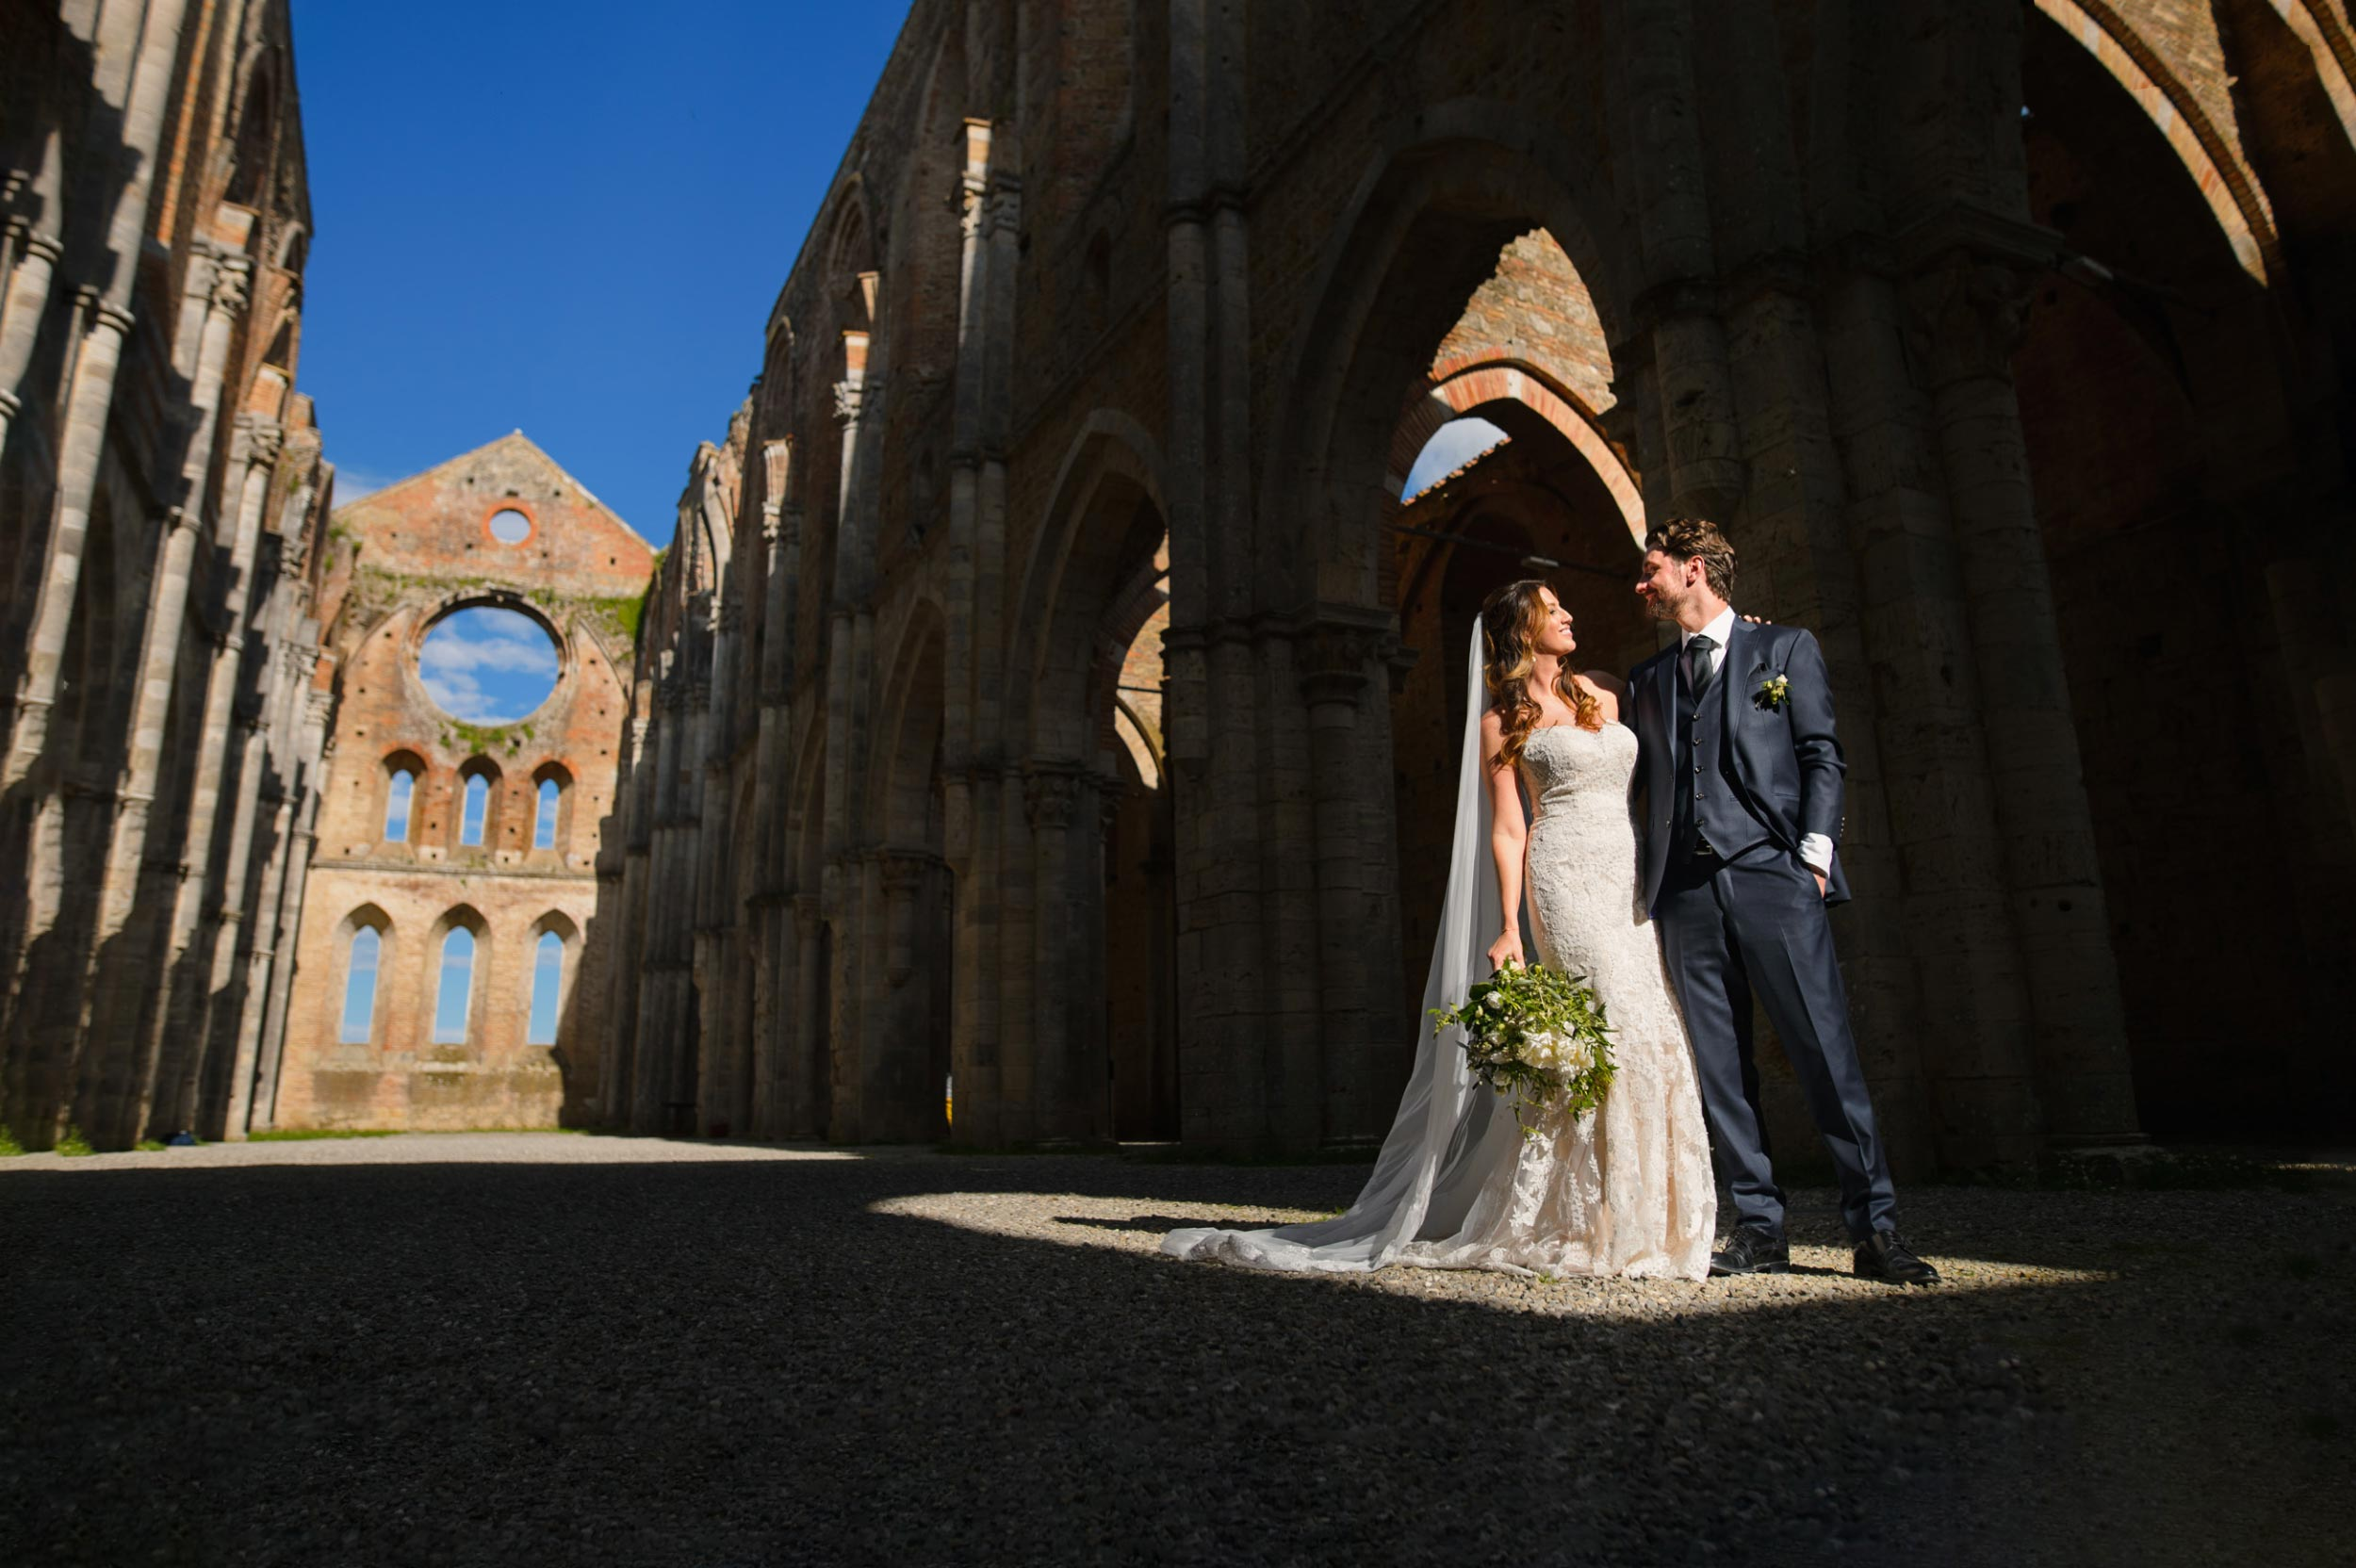 Destination Wedding in San Galgano, Tuscany - Alessia Bruchi Fotografia